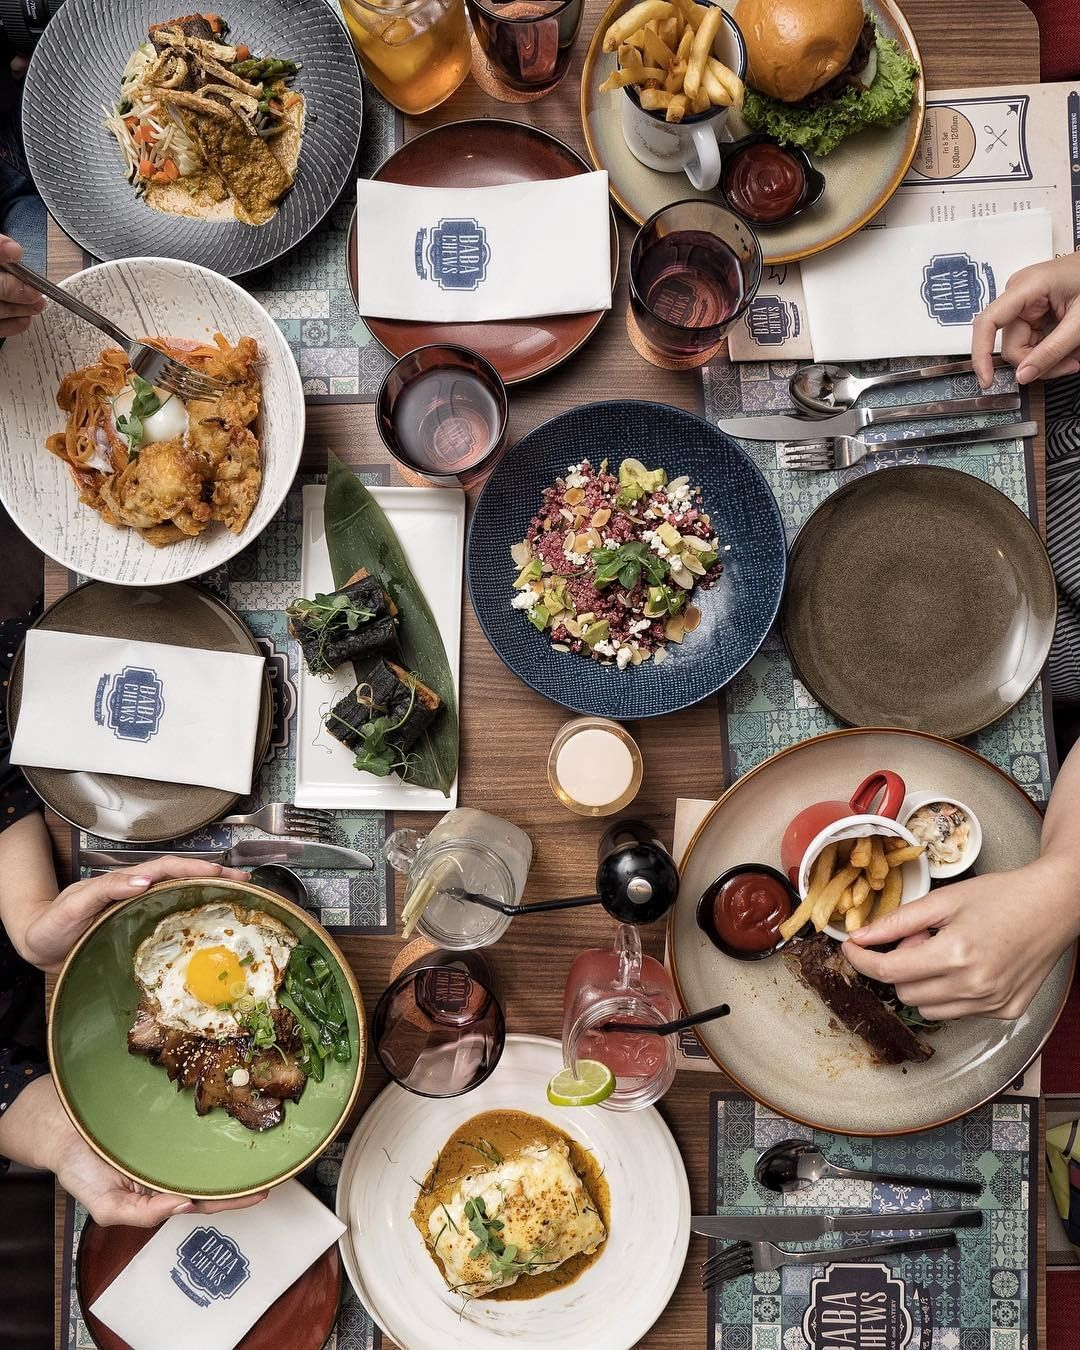 chopedeals year end sale 2019 - baba chews bar & eatery